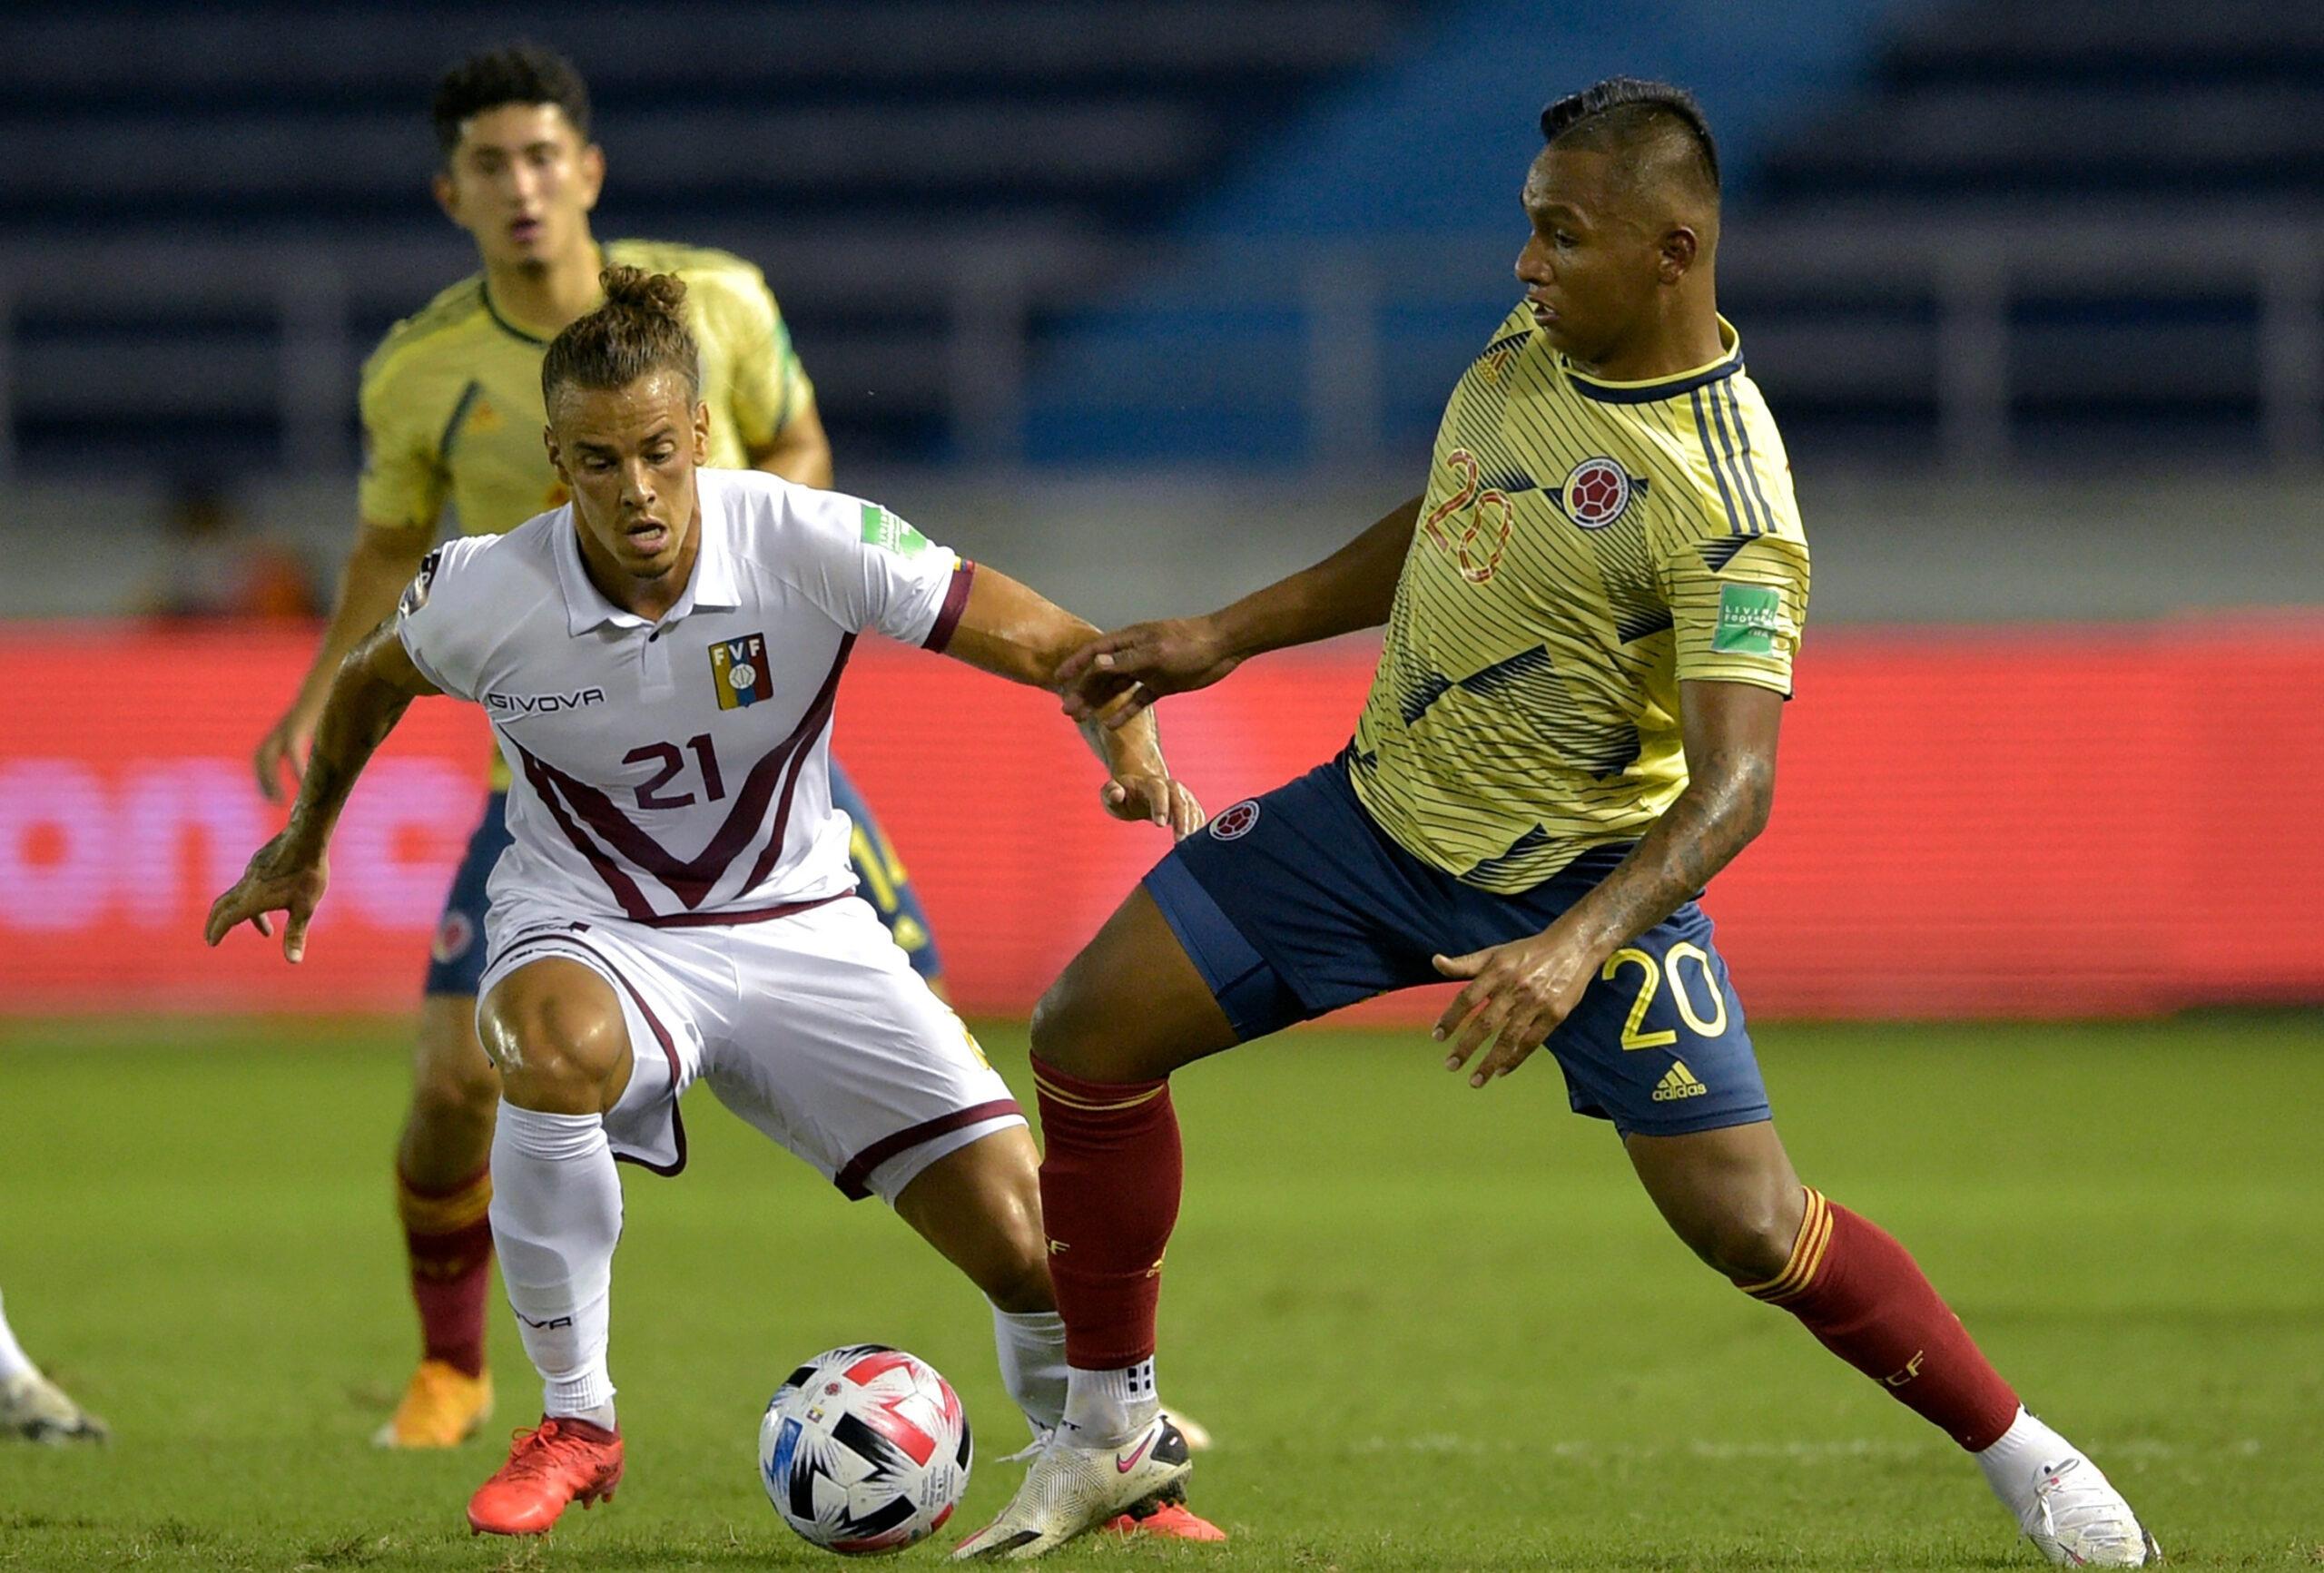 Soi kèo Colombia vs Venezuela, 04h00 ngày 18/6, Copa America